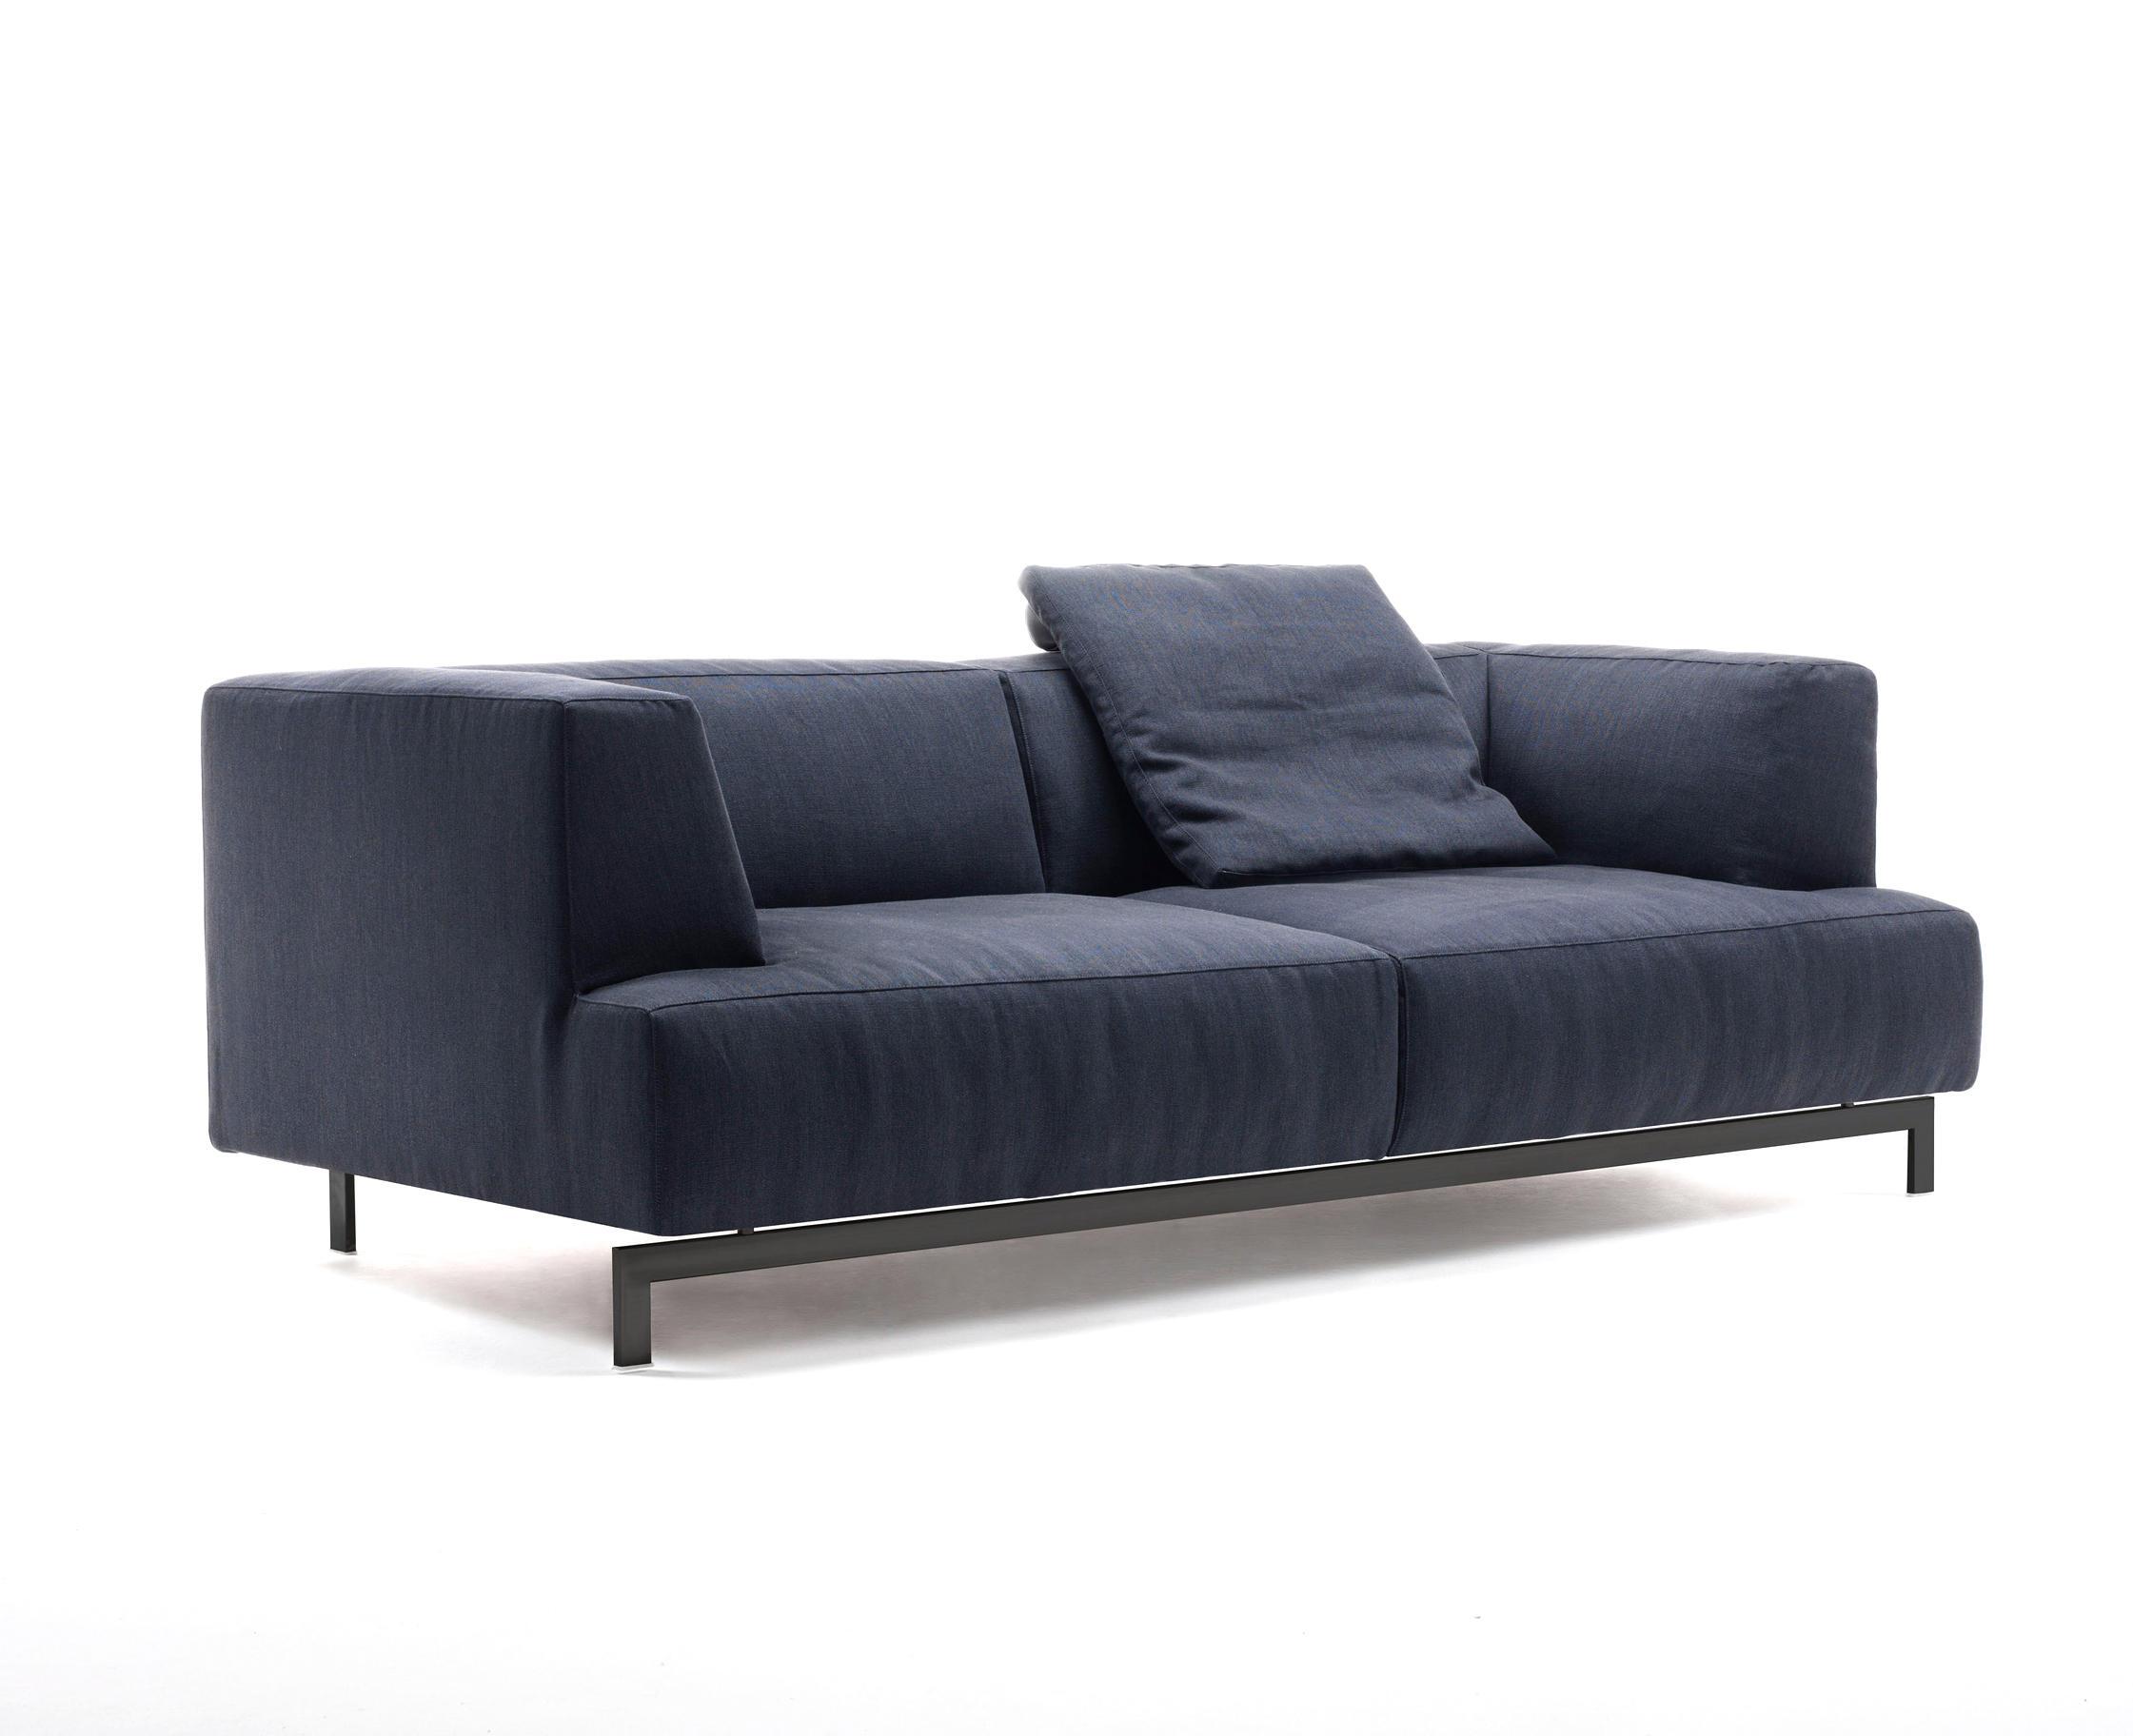 metrocubo sofas from living divani architonic. Black Bedroom Furniture Sets. Home Design Ideas